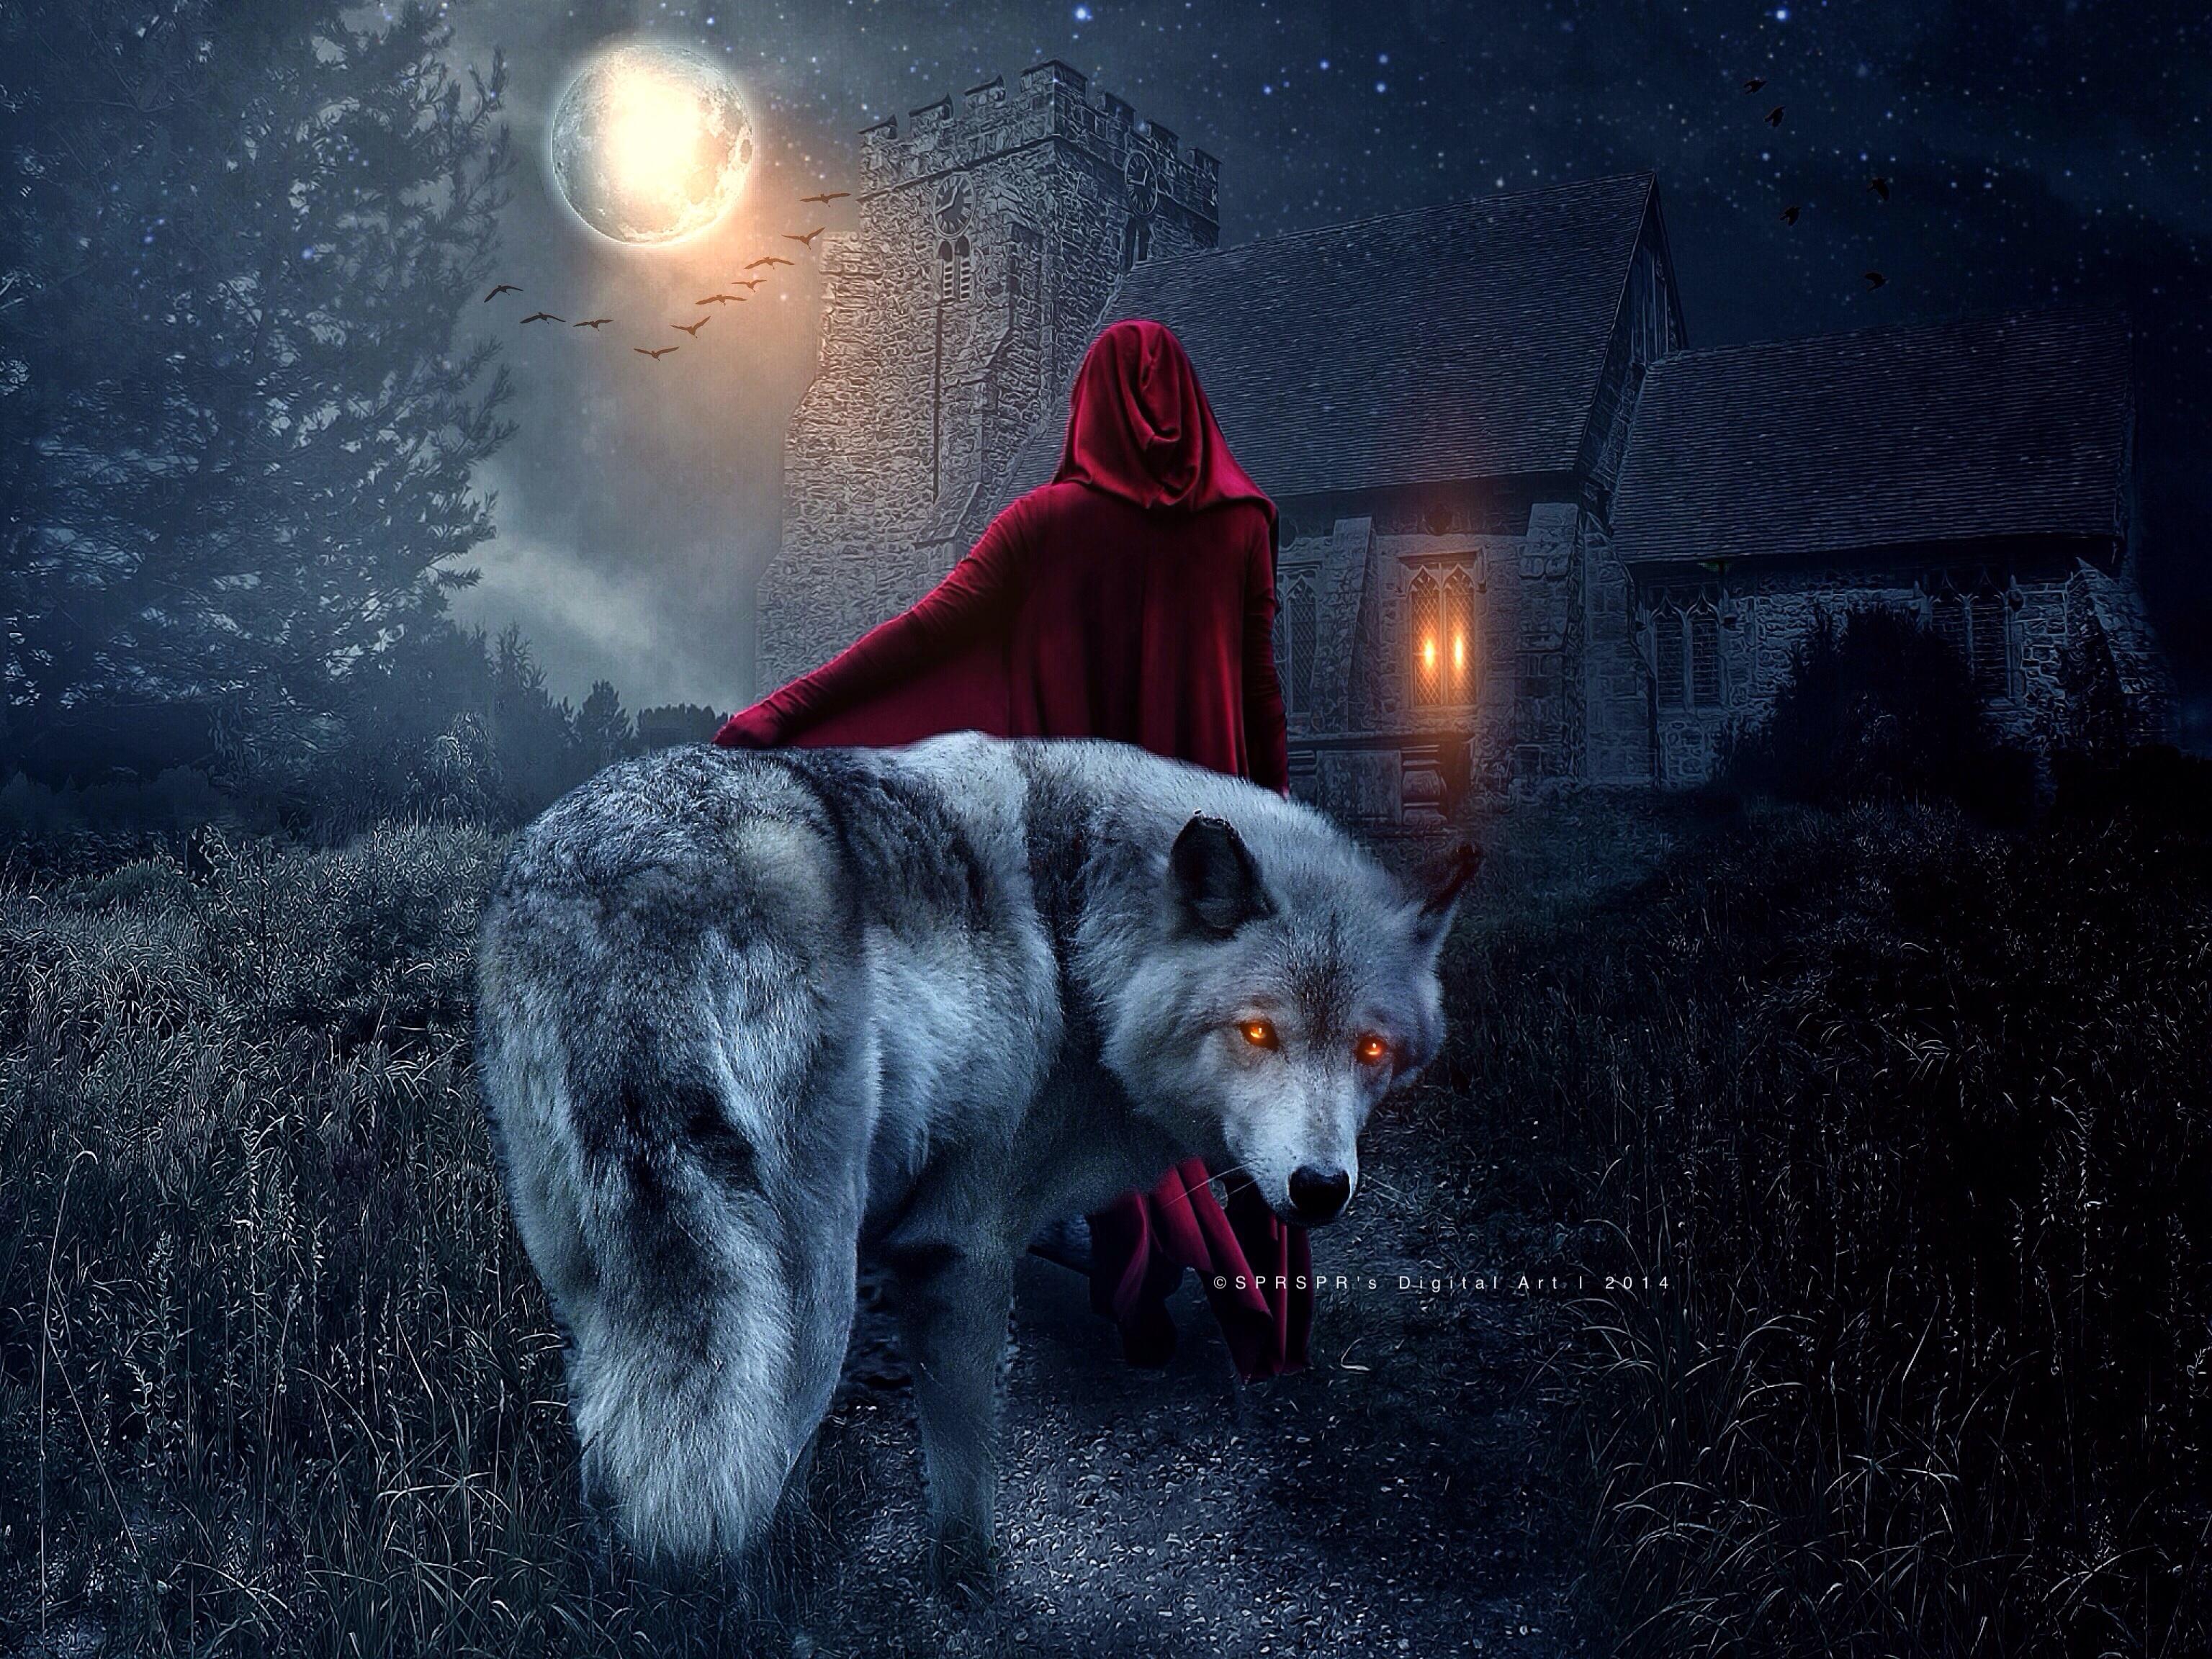 Not a Fairytale I by SPRSPRsDigitalArt